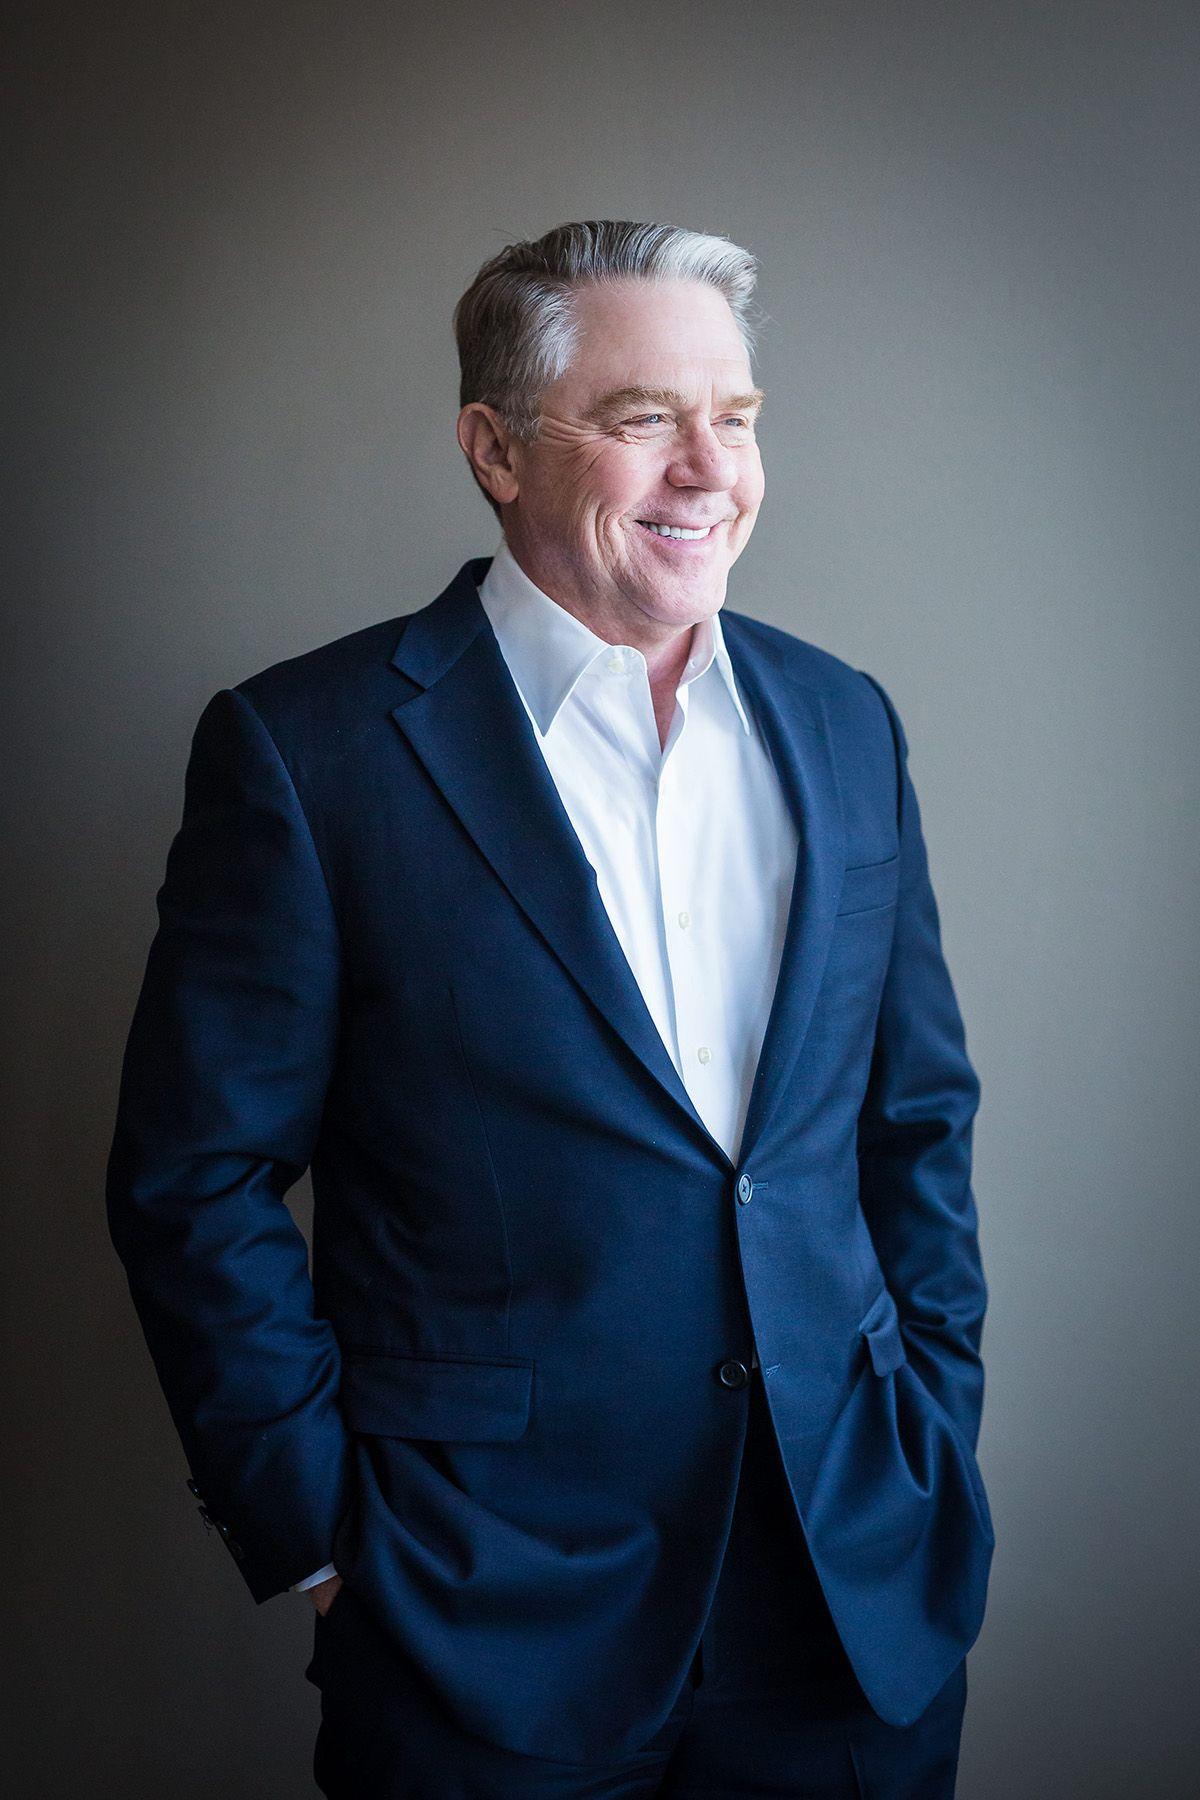 Michael T Mihm Inheritance Disputes And Estates Litigation Attorney Denver Colorado.